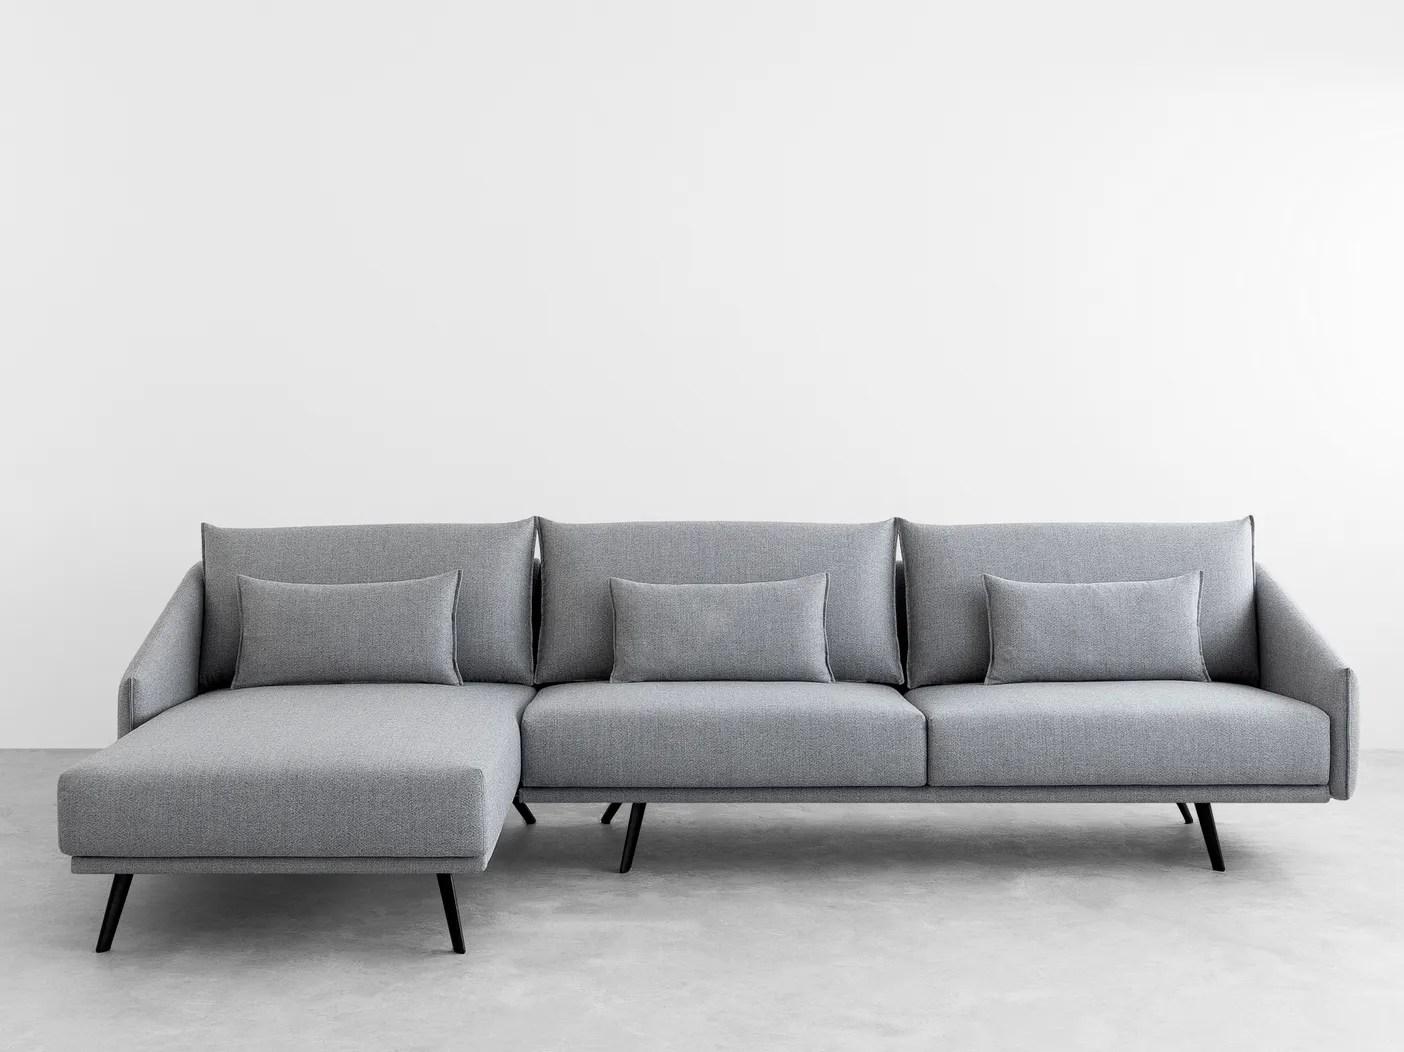 Sofa Chaise Extraible Longue